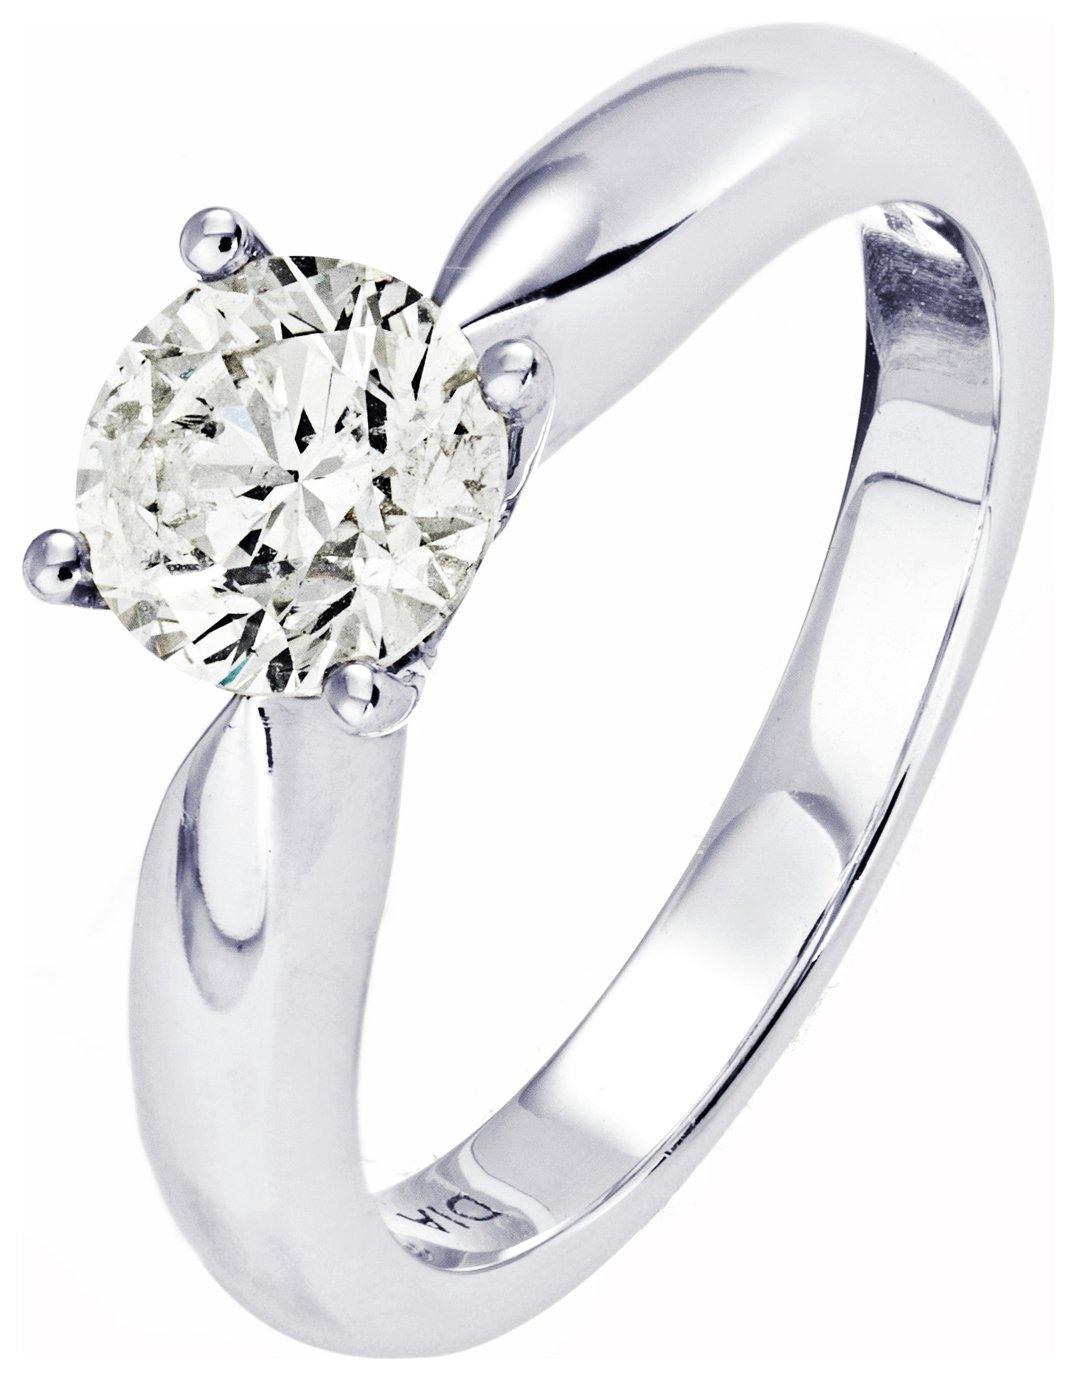 18 Carat White Gold 1 Carat Diamond - Solitaire Ring - Size J